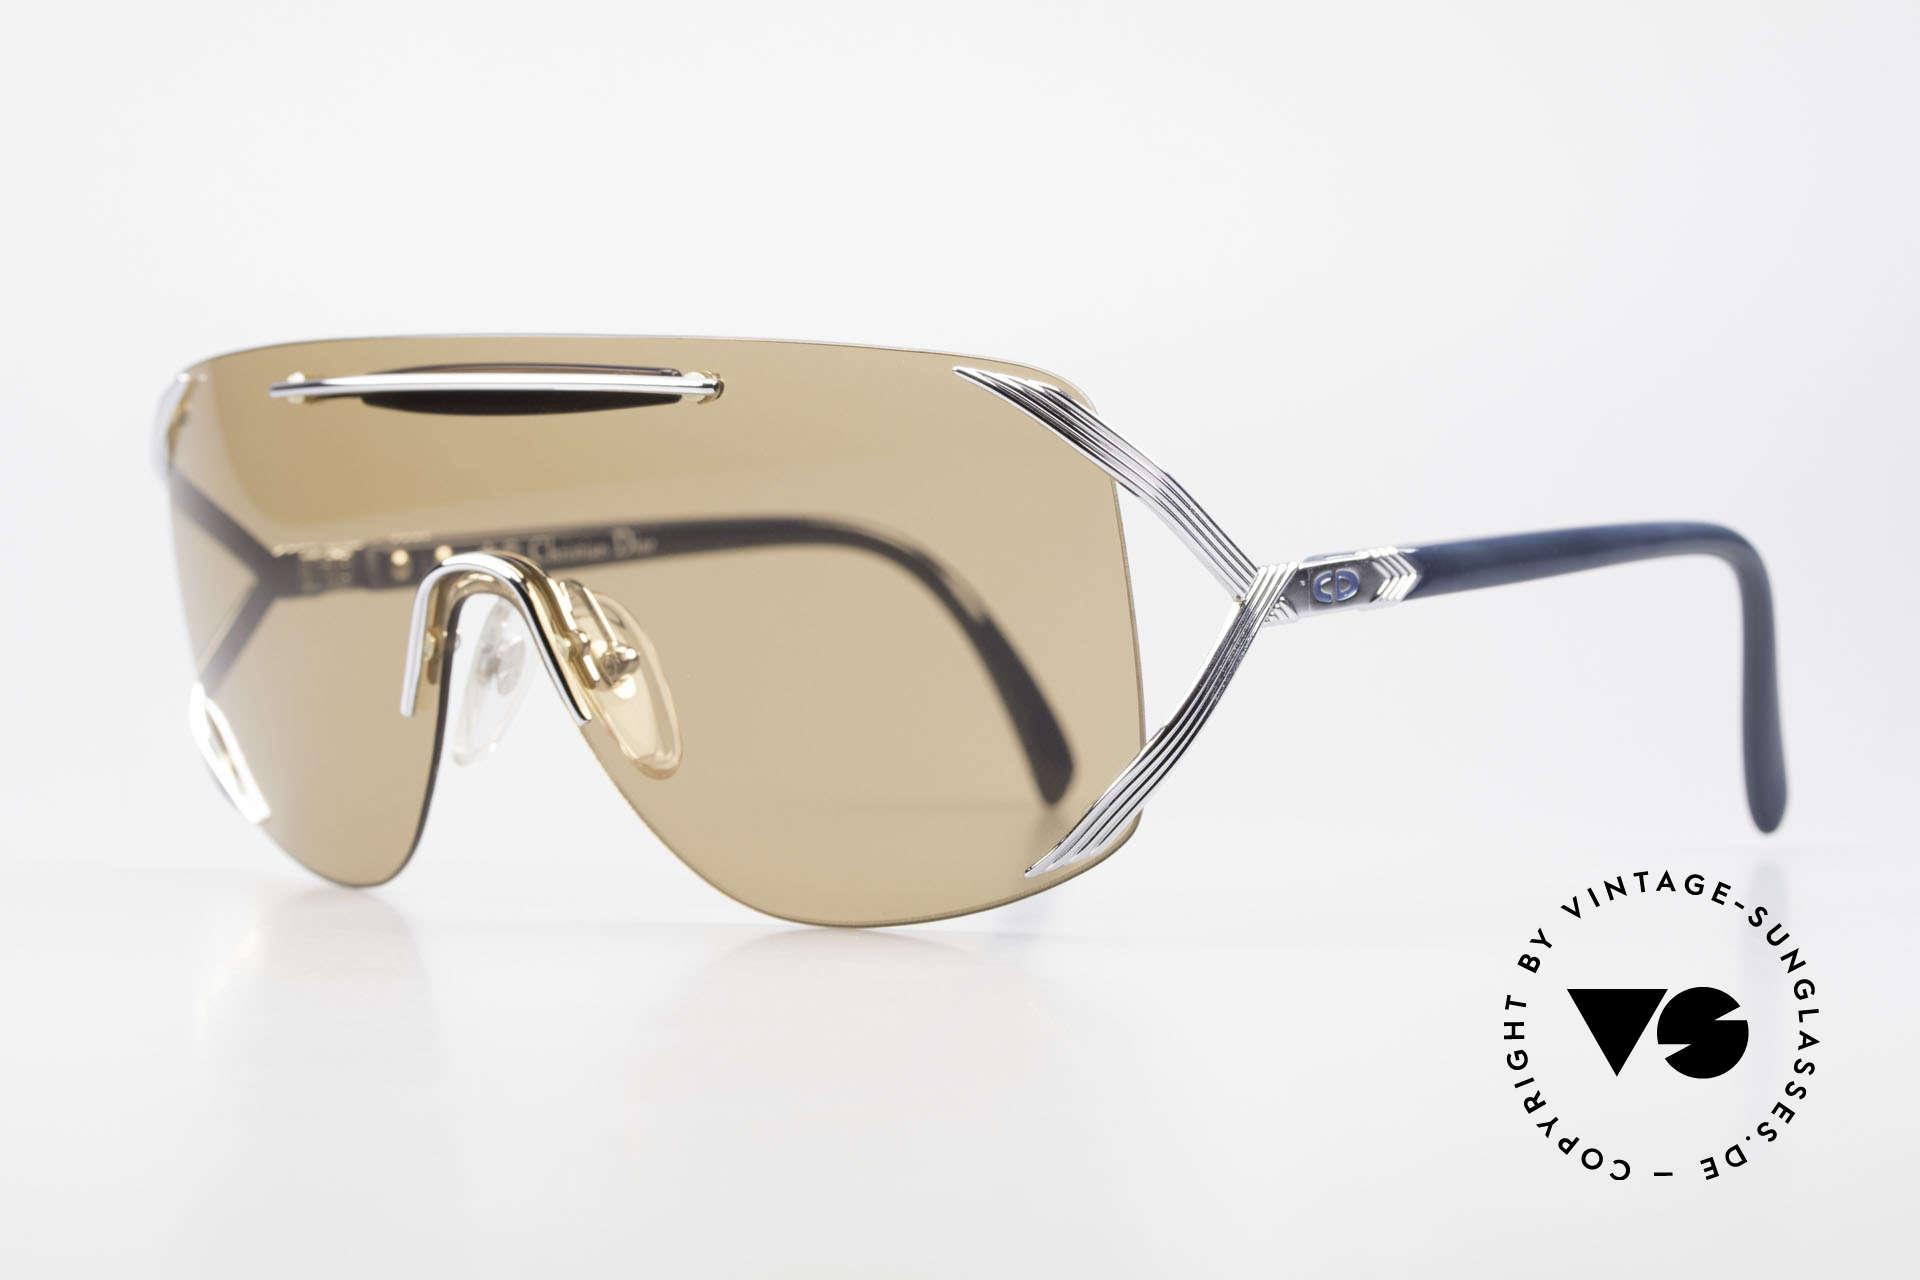 Christian Dior 2434 Panorama View Sonnenbrille, brilliantes, sehr seltenes 'Panorama View' Modell, Passend für Damen